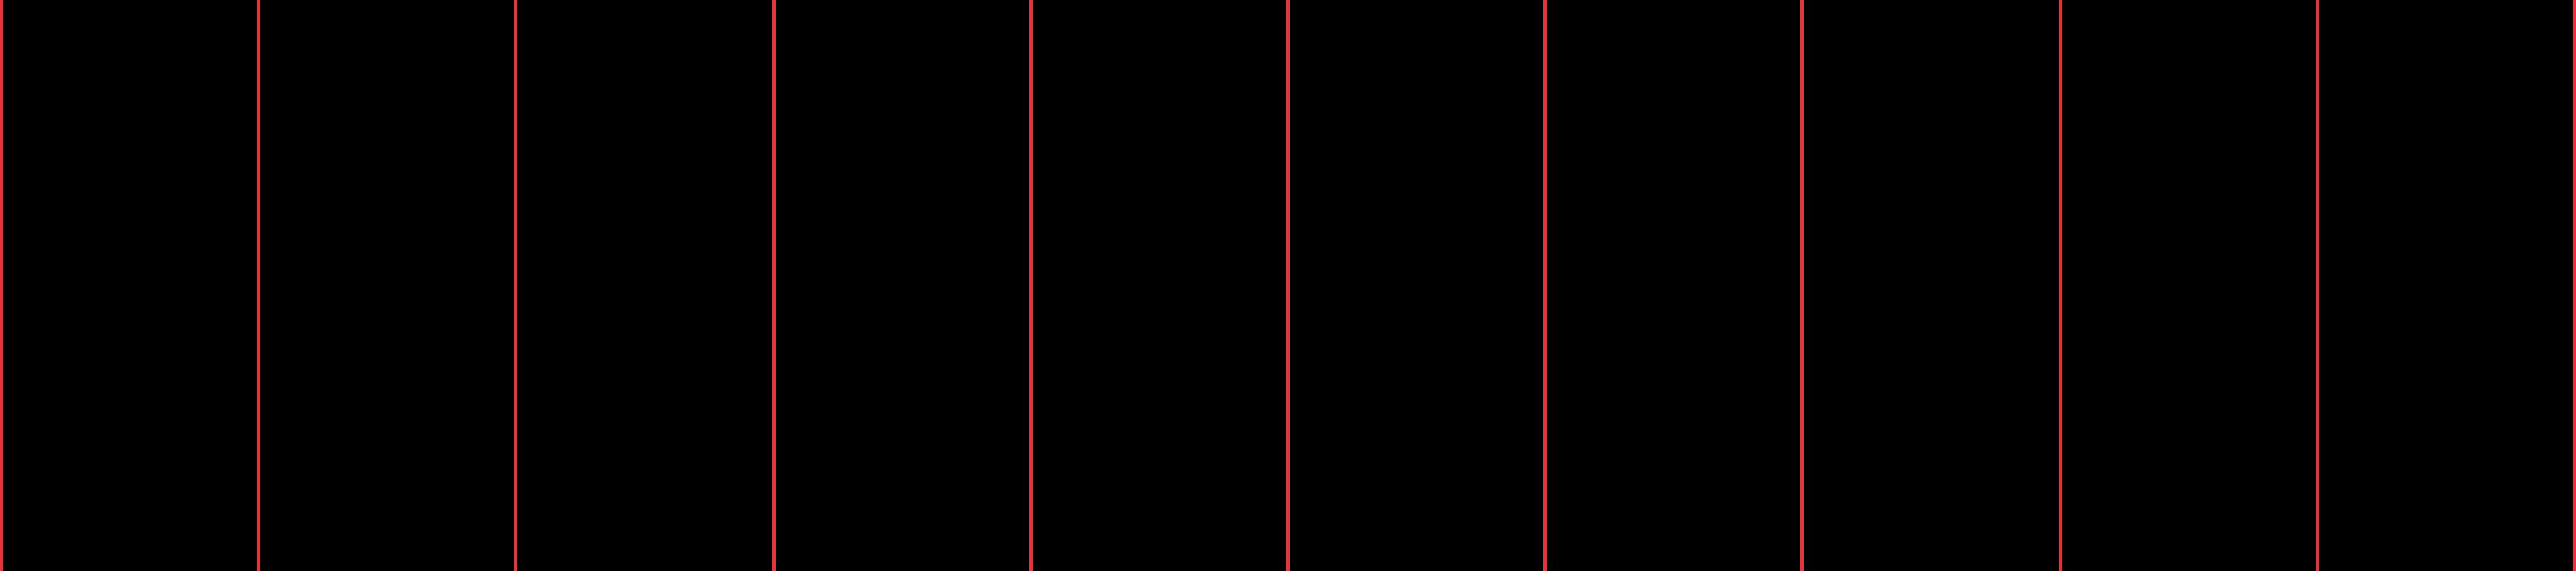 overtone-drpublik-figures